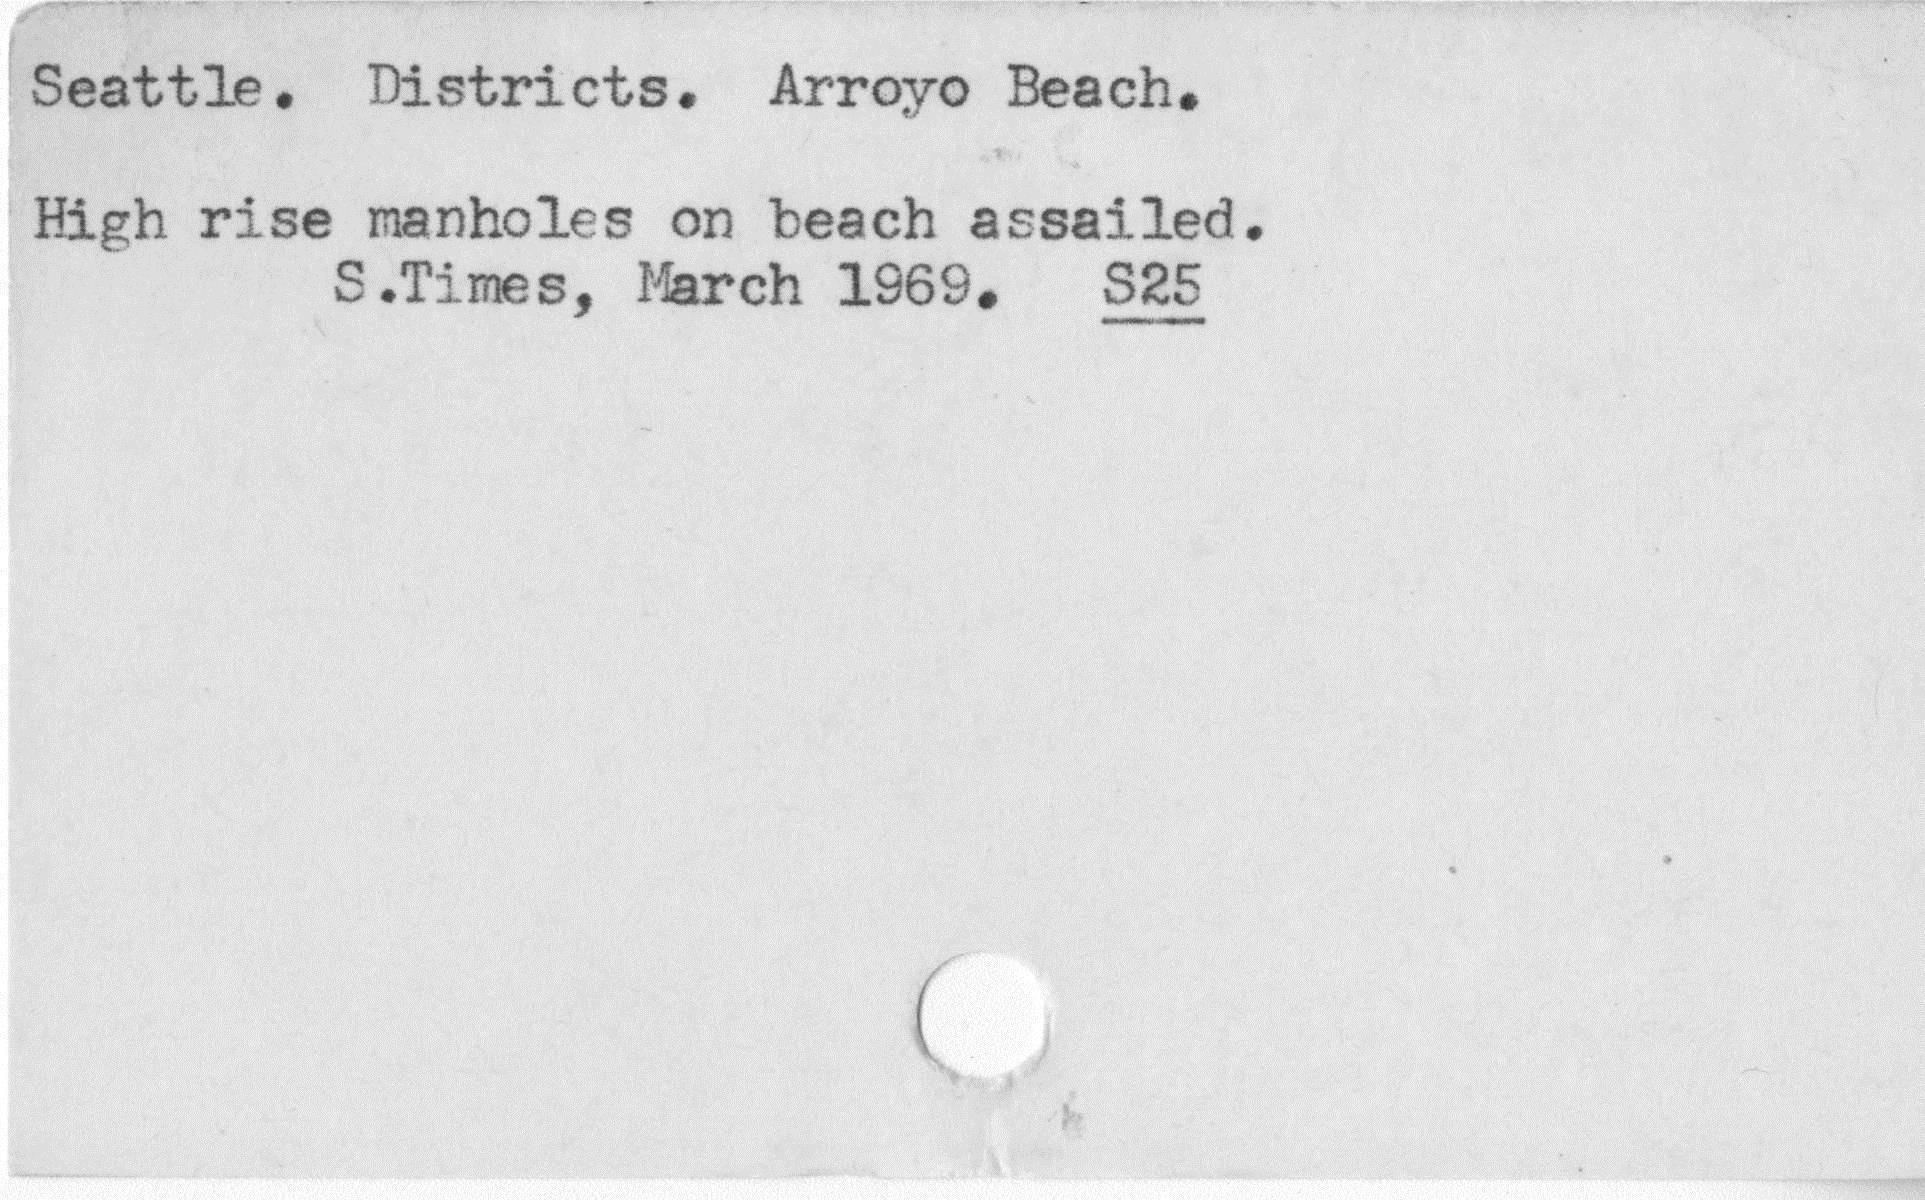 Seattle. Districts. Arroyo Beach.